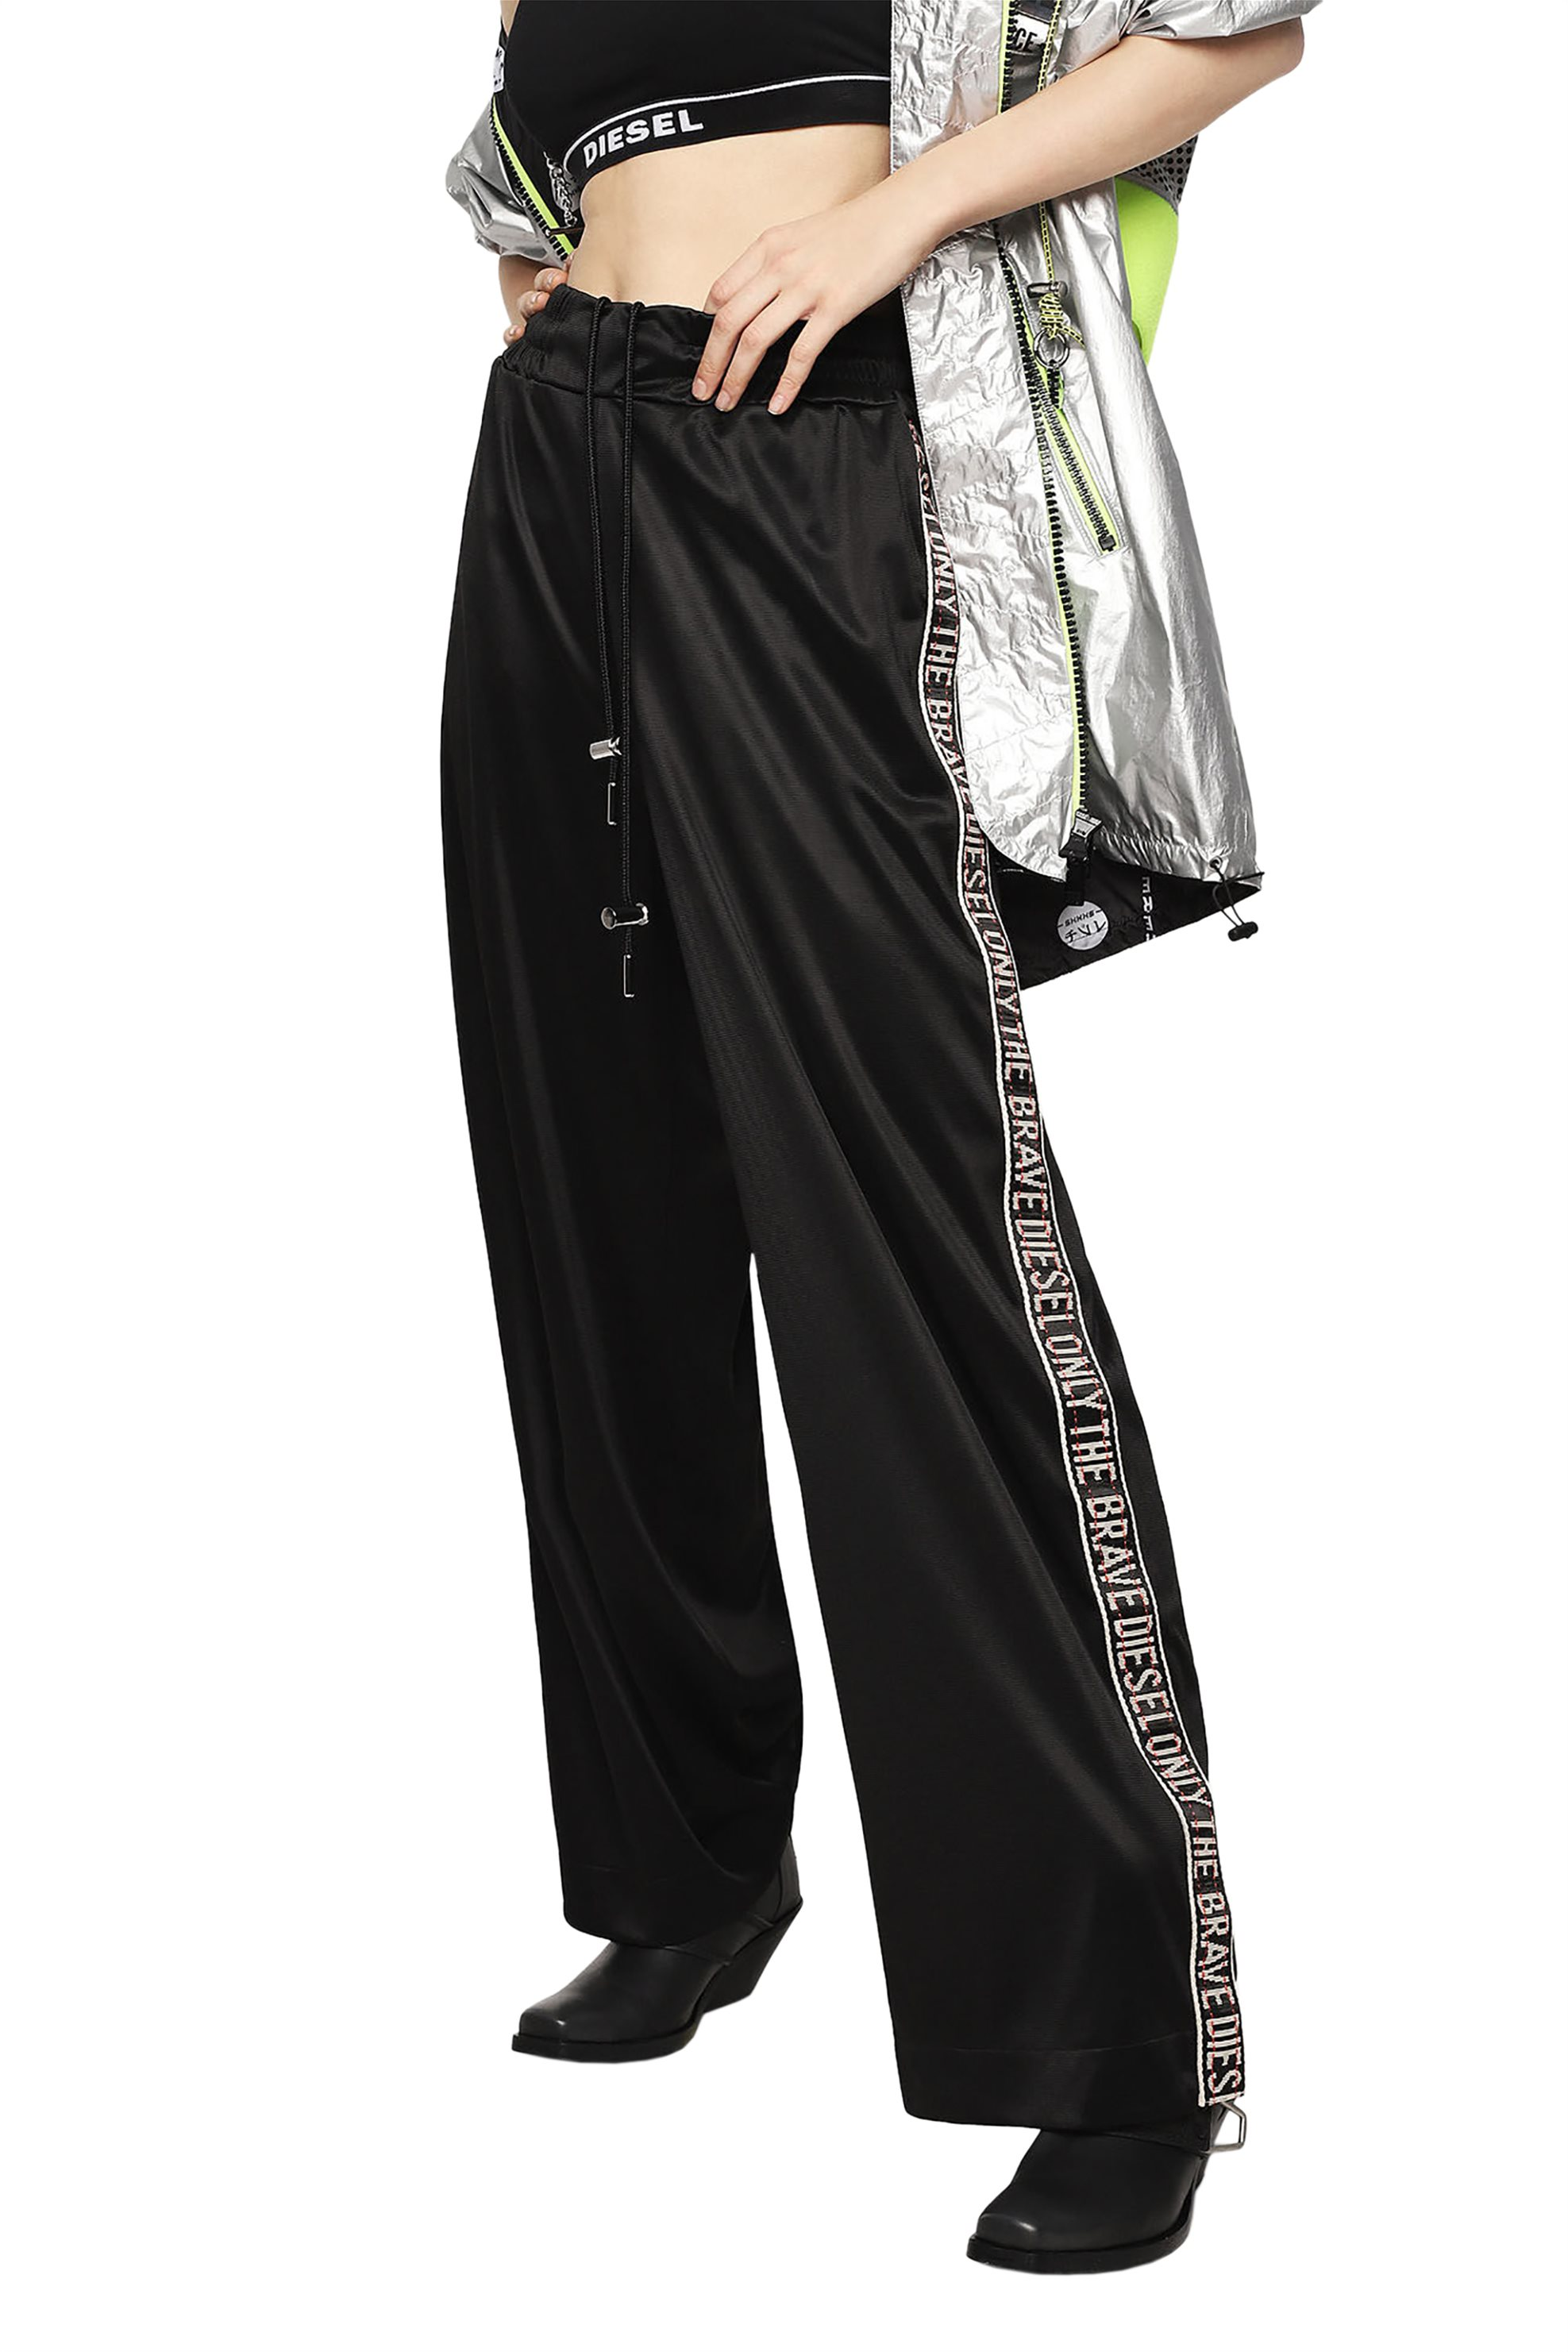 1d2212a0f256 Notos Diesel γυναικείο παντελόνι Rolen - 00SSSC 0CARX - Μαύρο